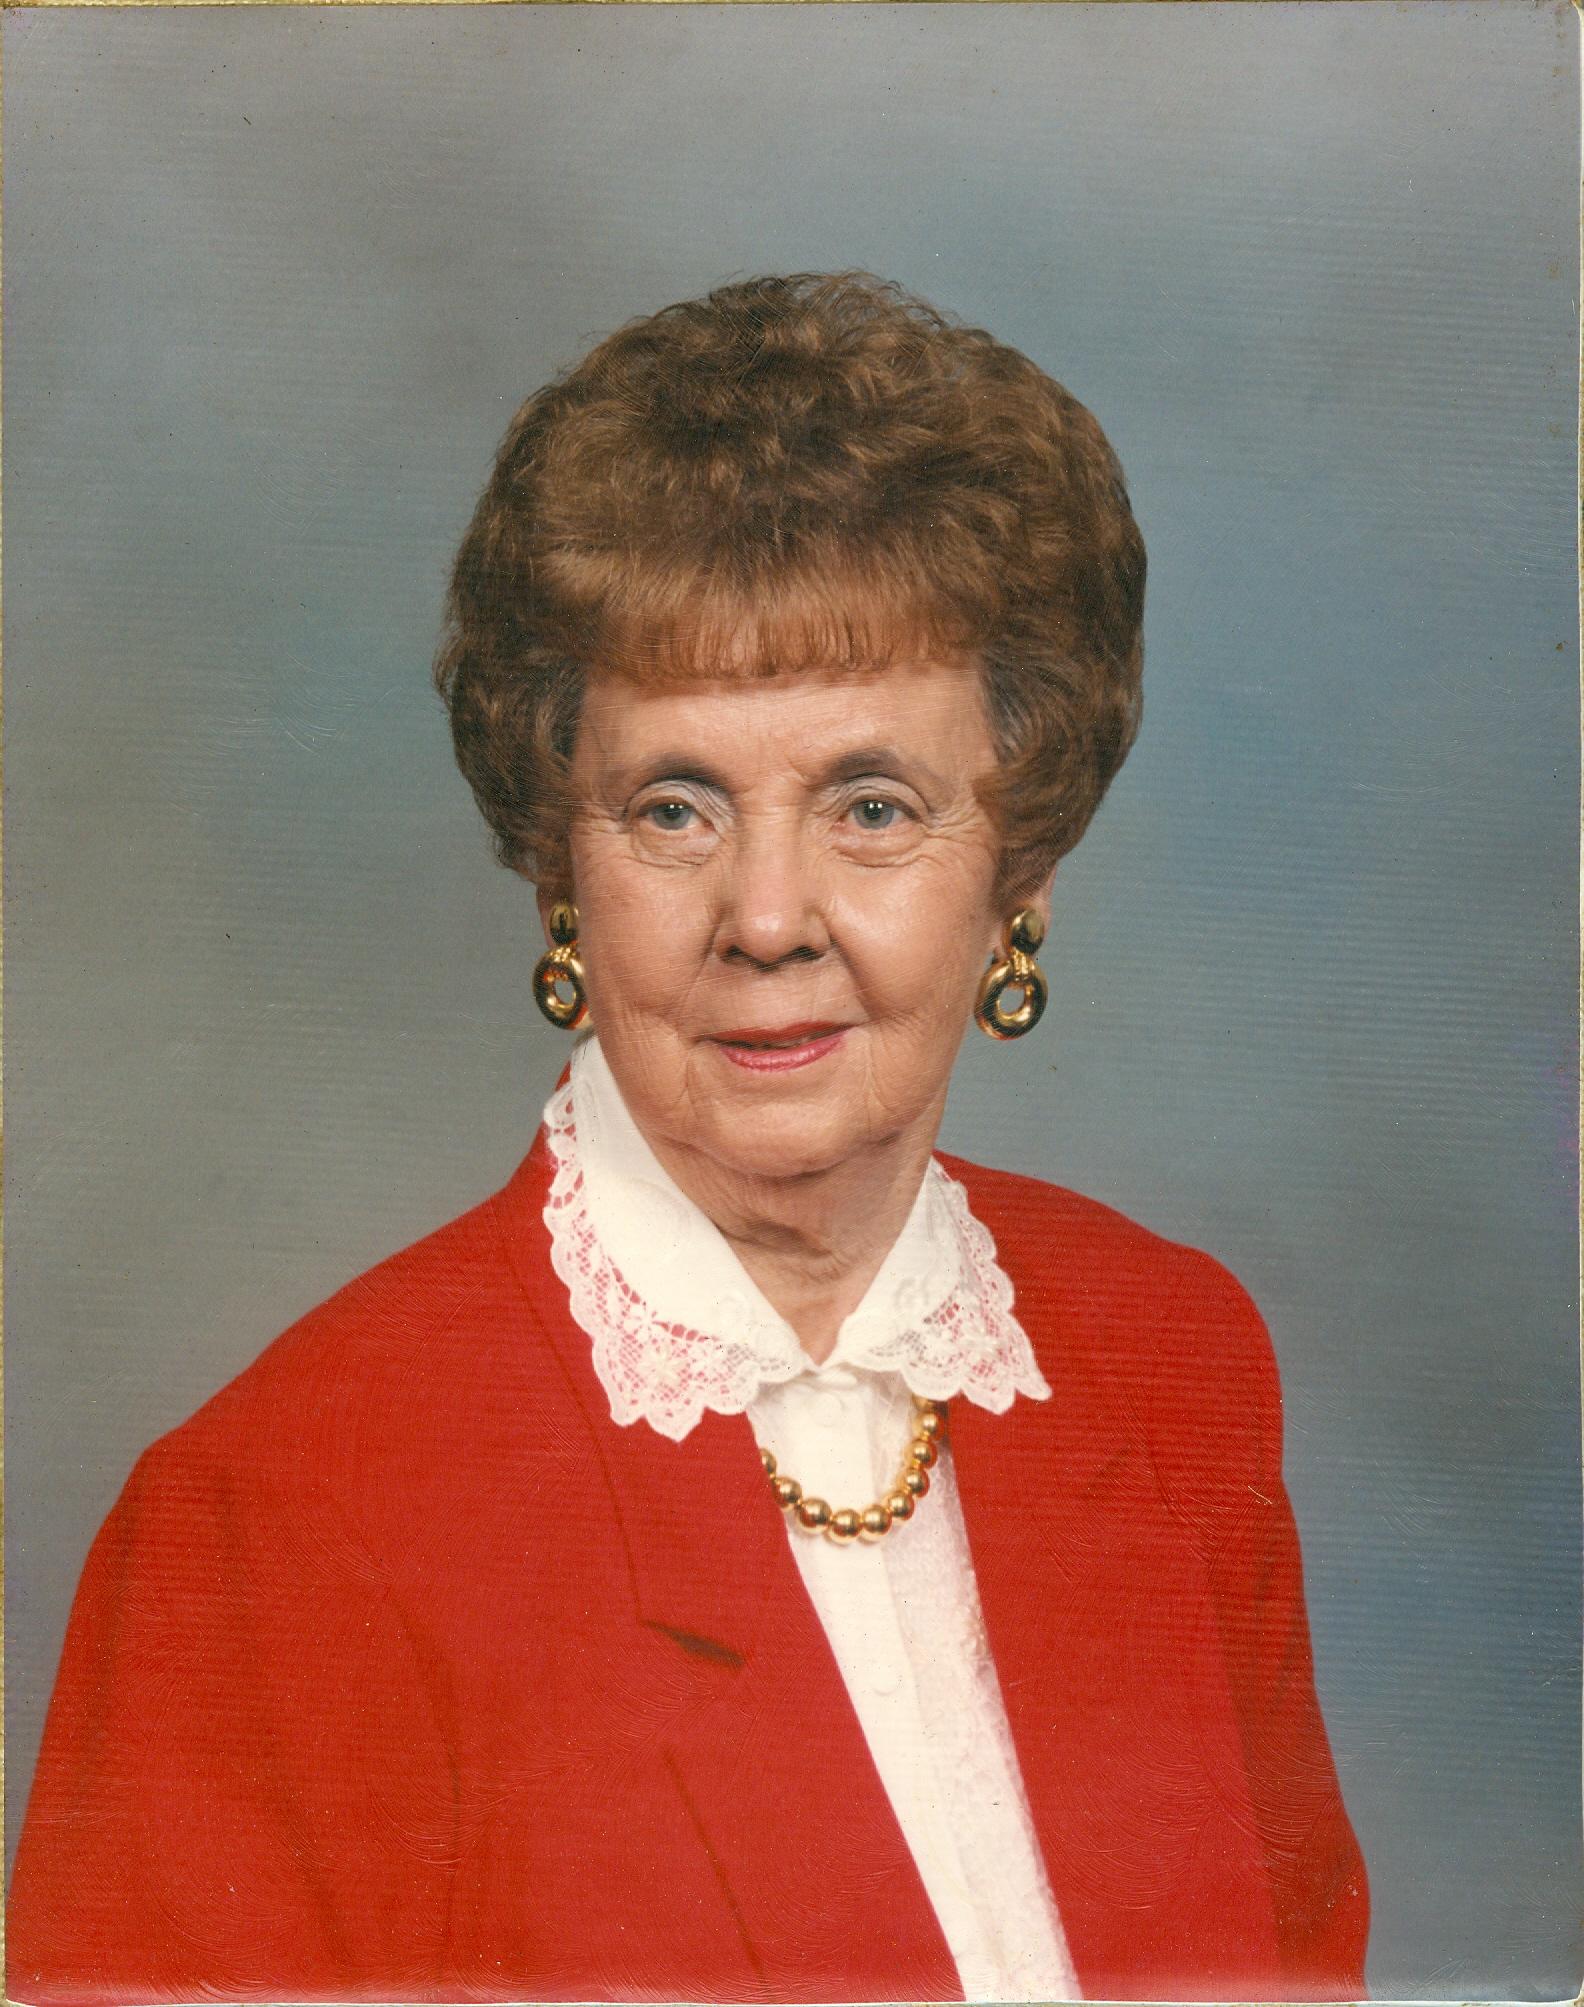 Thelma Marie Clark